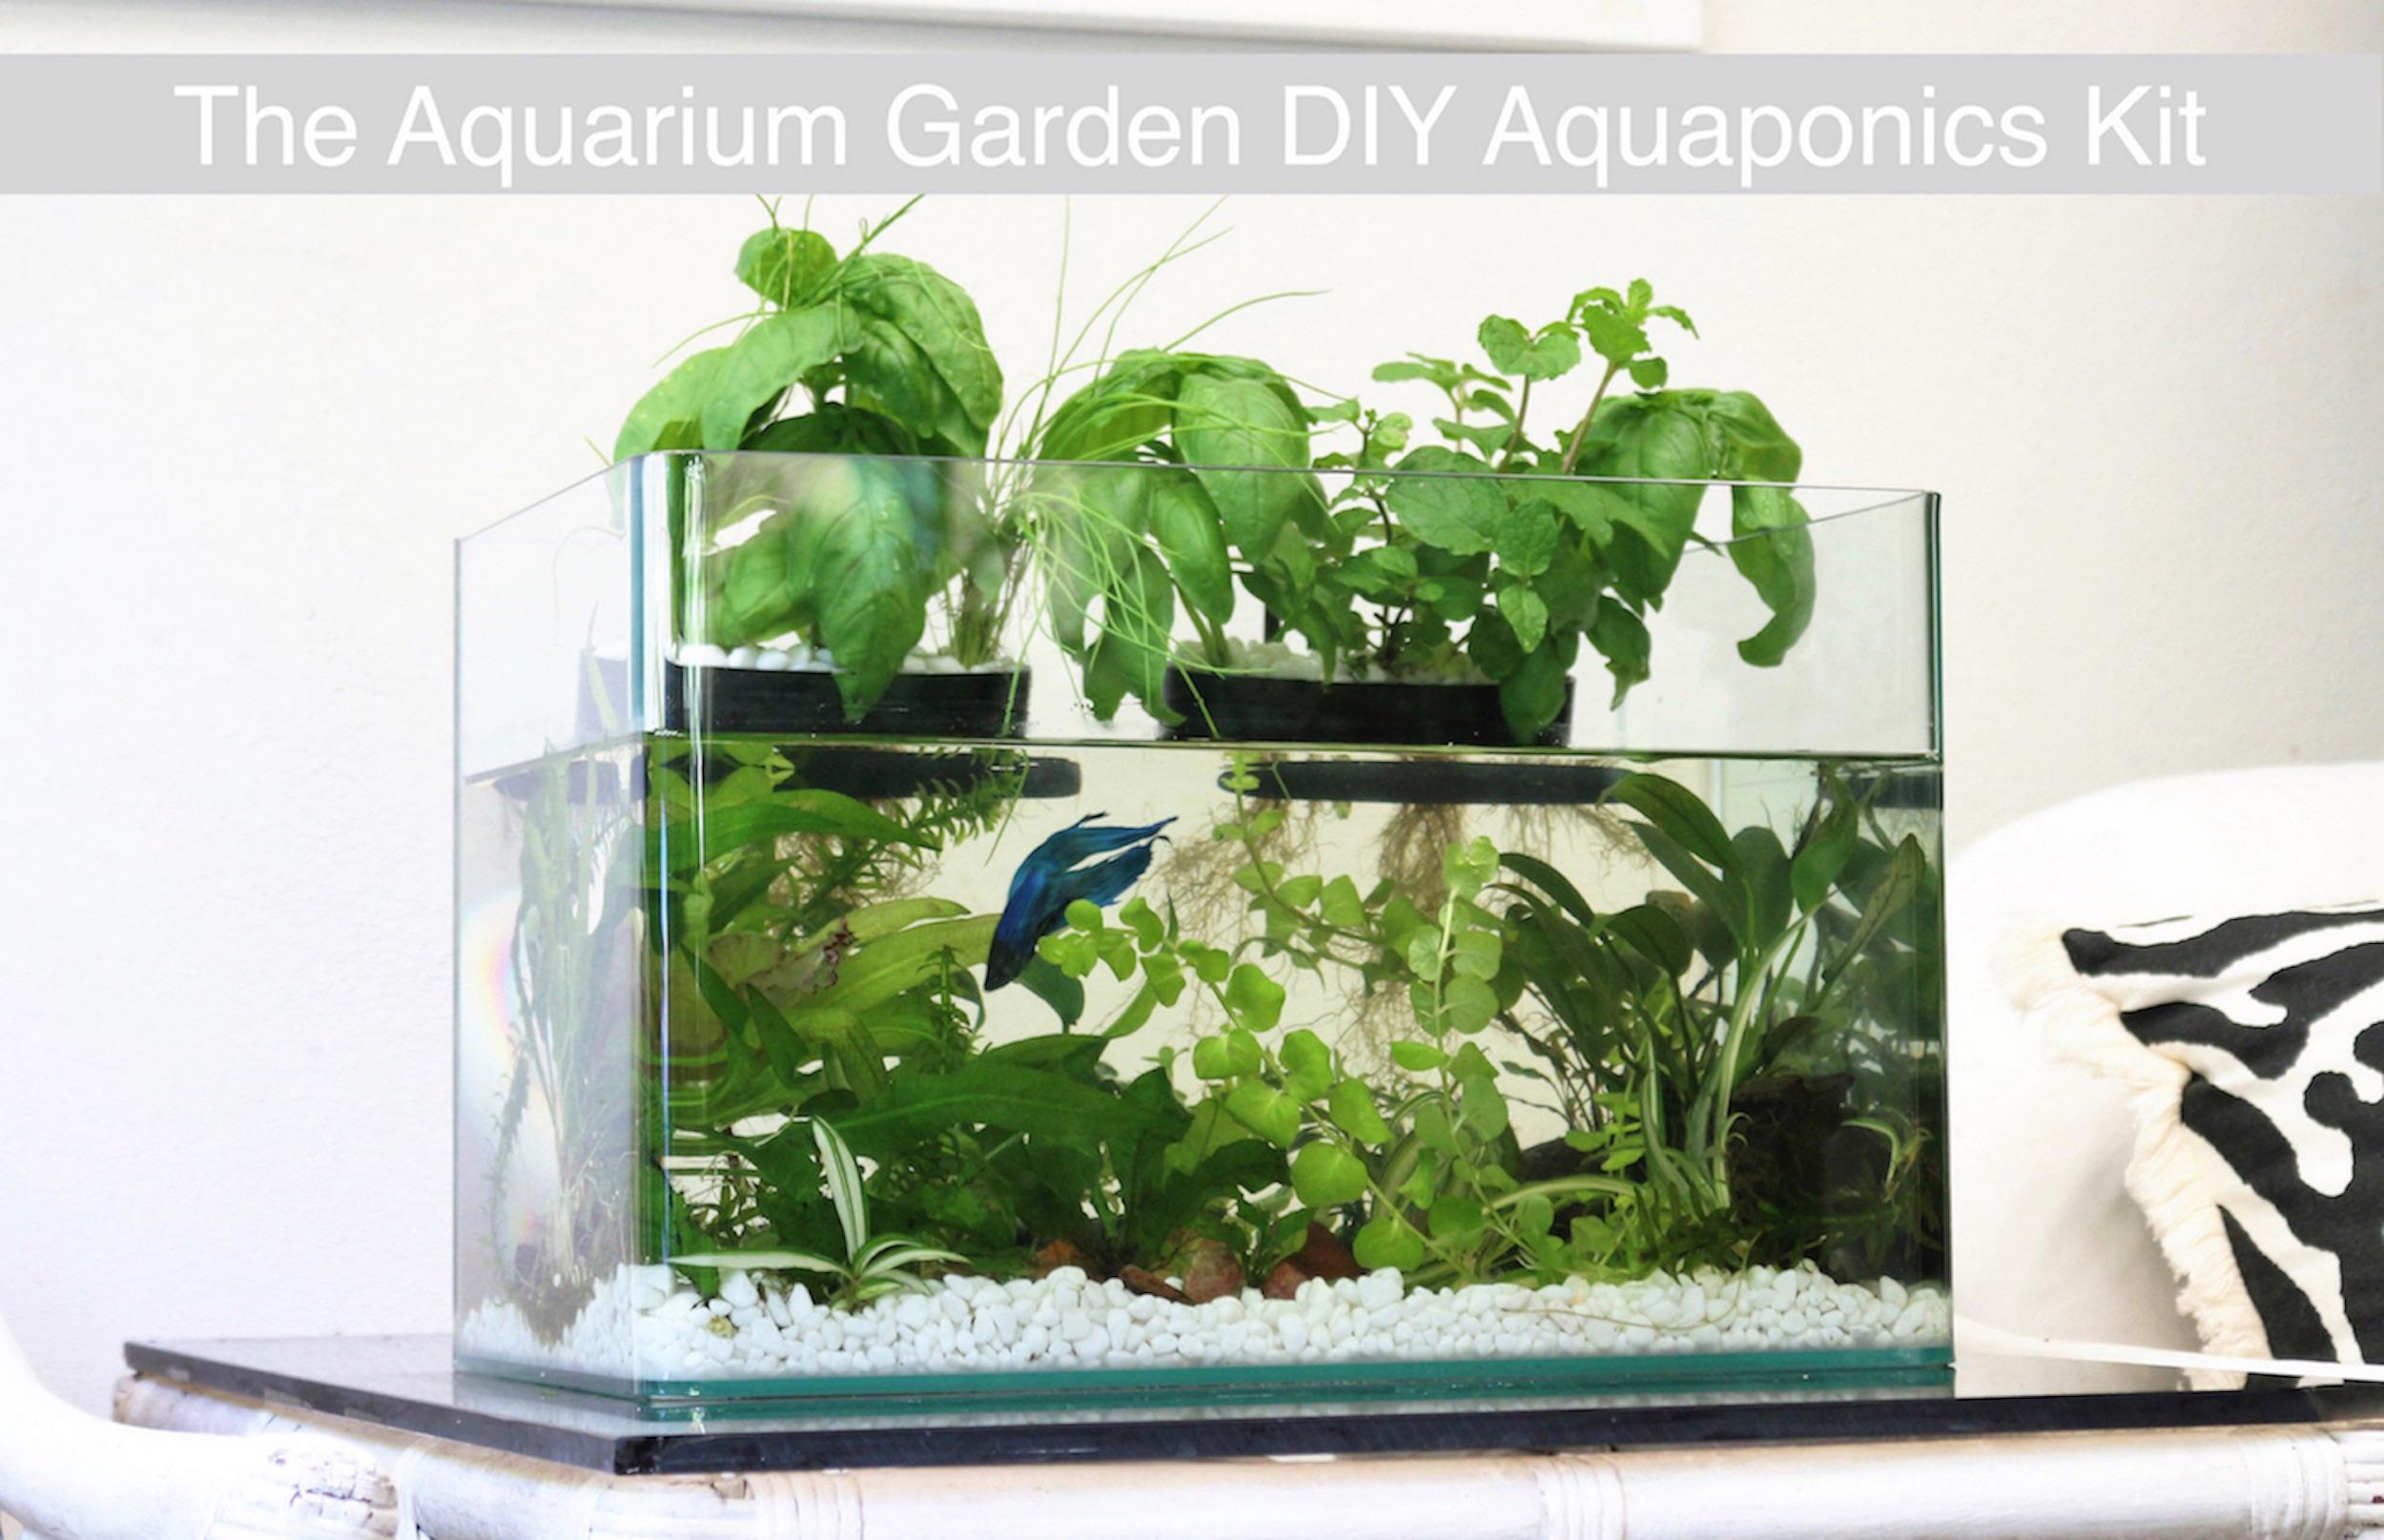 Classy Aquarium Garden Transforms Any Fish Tank Into A Lush Ecosystem Vertical Garden Inhabitat Green Architecture Vertical Gardening Kits Uk Vertical Garden Kit Home Depot garden Vertical Gardening Kit